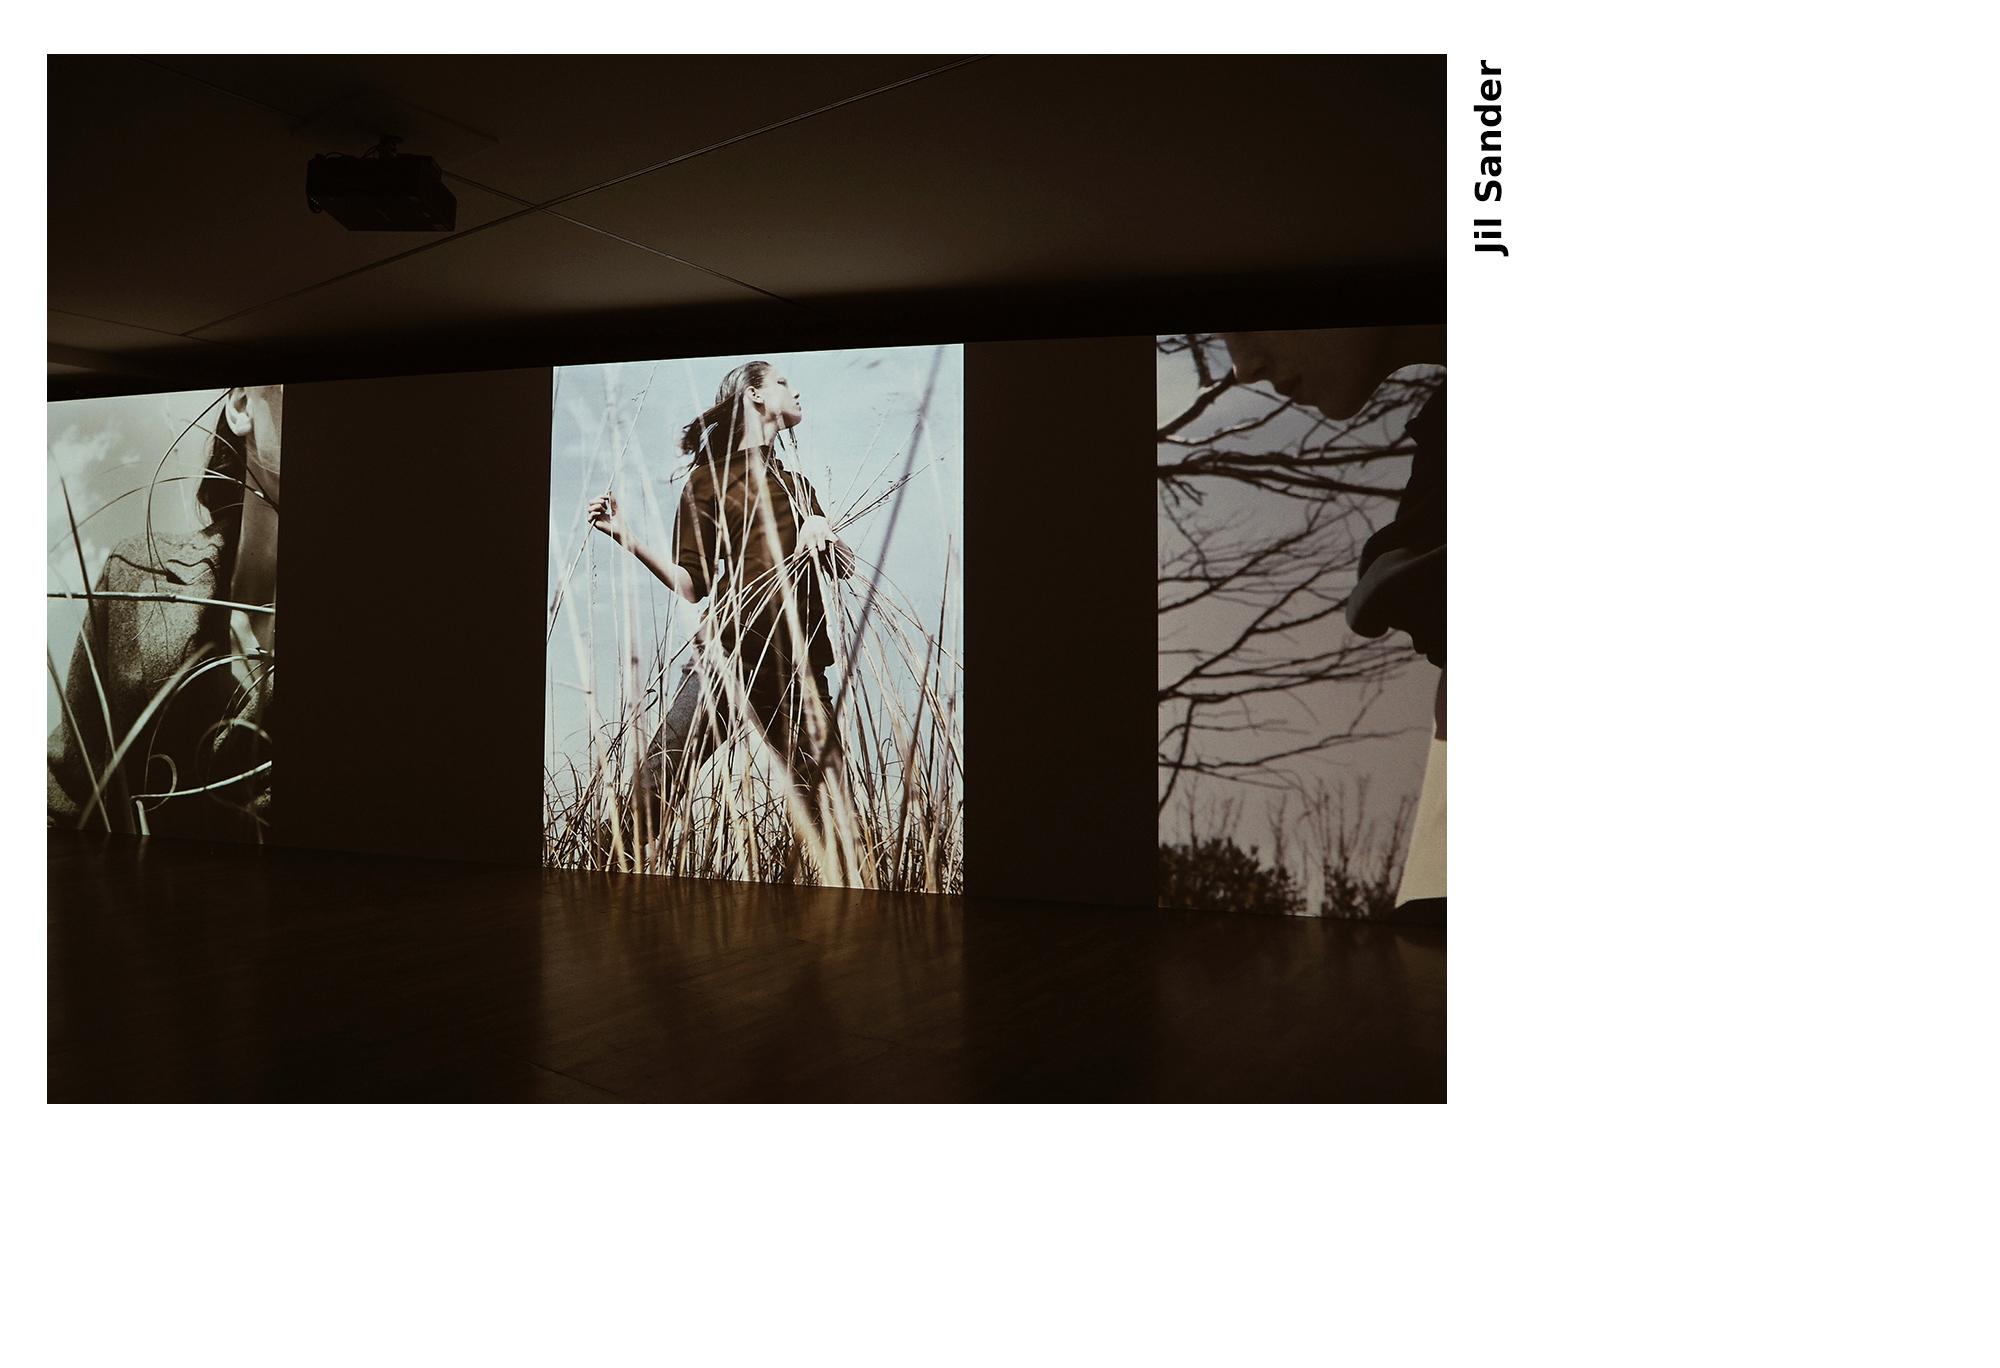 jil-sander-prasens-ausstellung-exhibition-museum-angewandte-kunst-frankfurt-julia-carevic